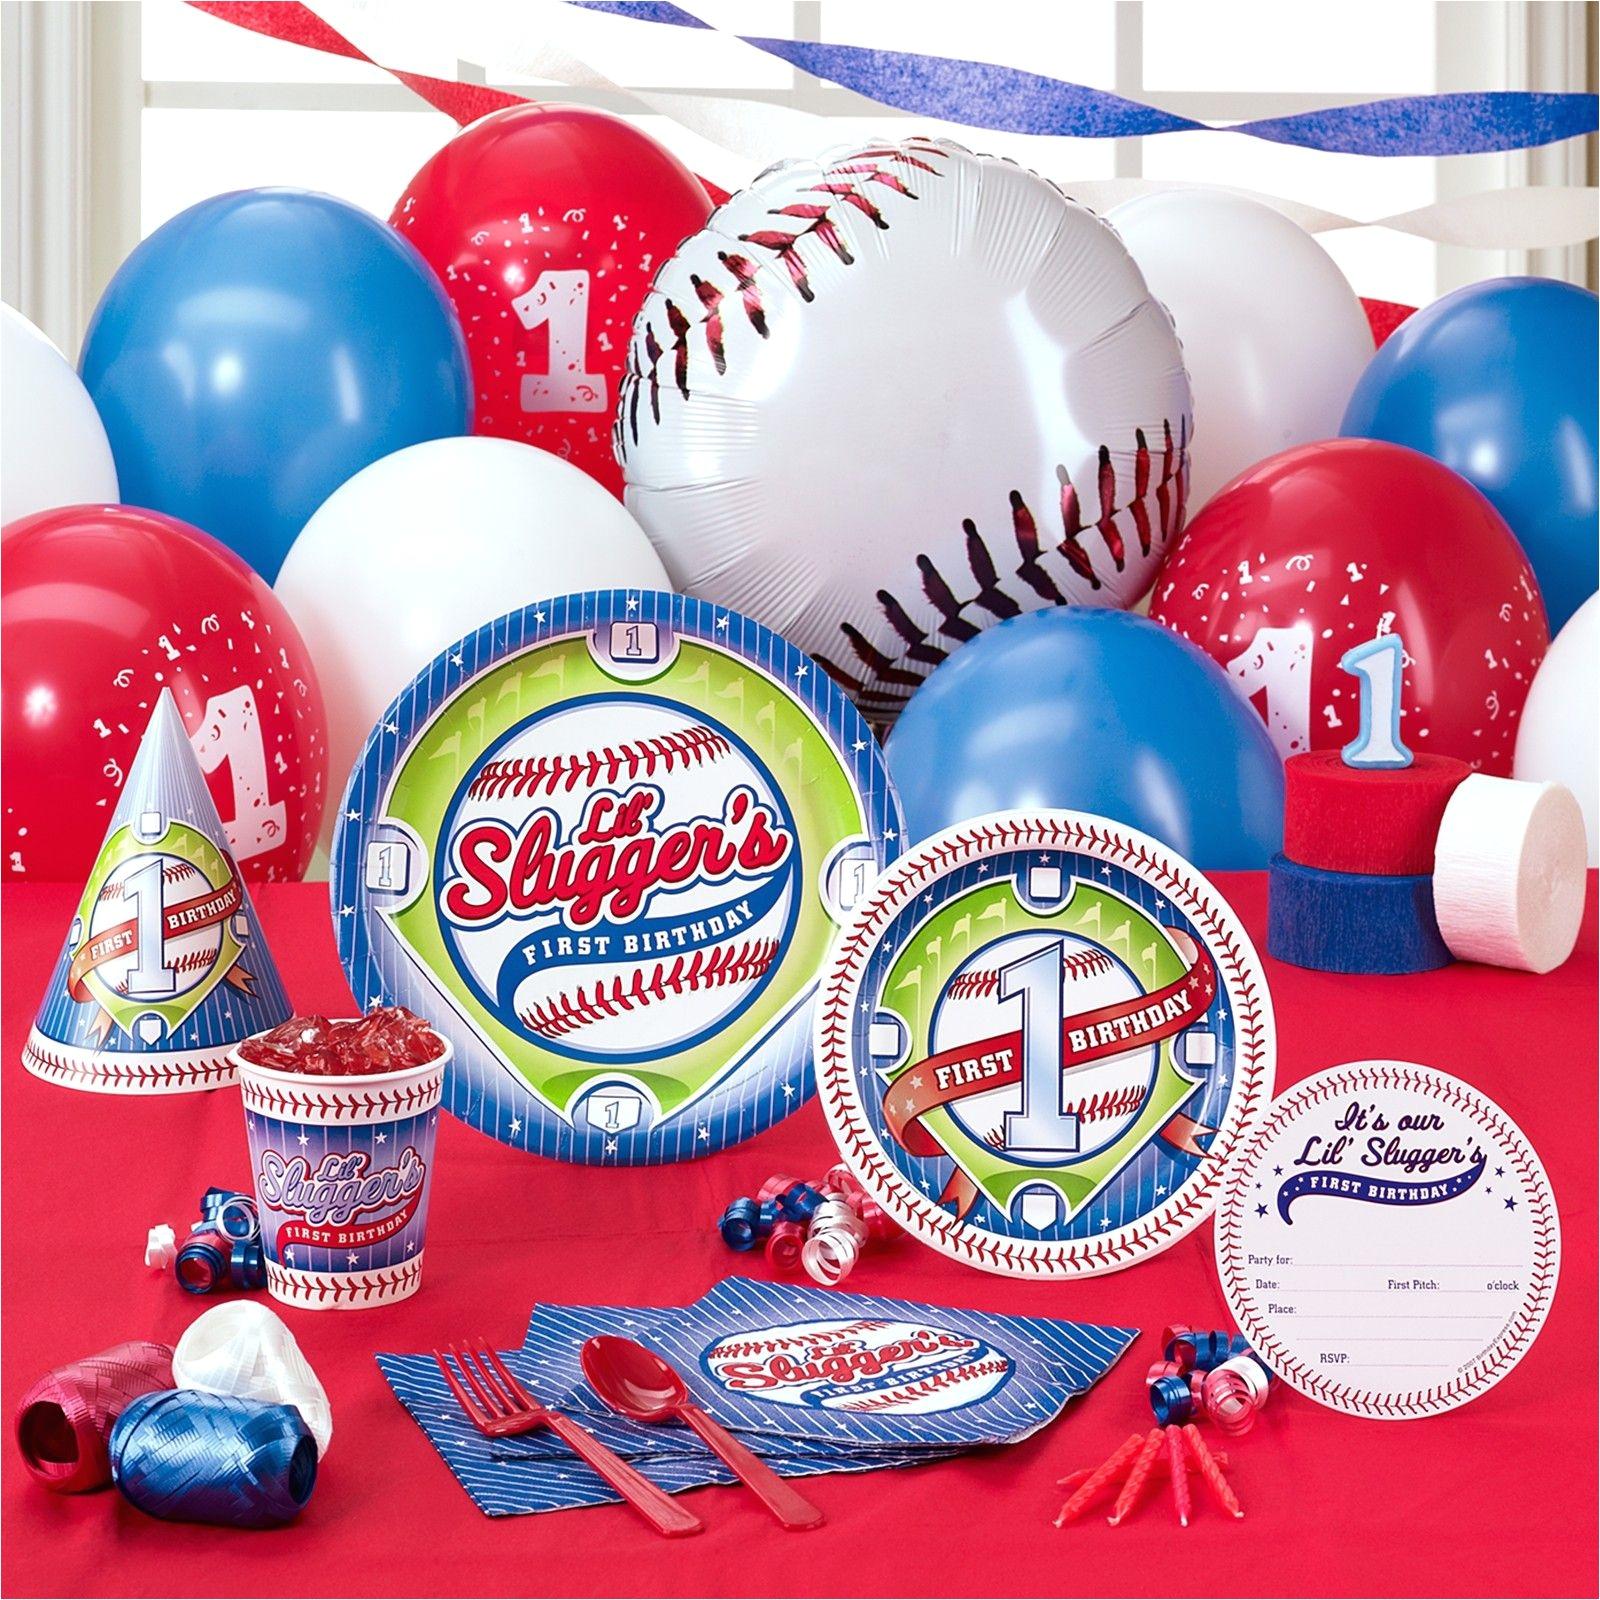 Party City Thomas the Train Decorations Little Slugger S 1st Birthday Party theme Birthday Invites Ideas